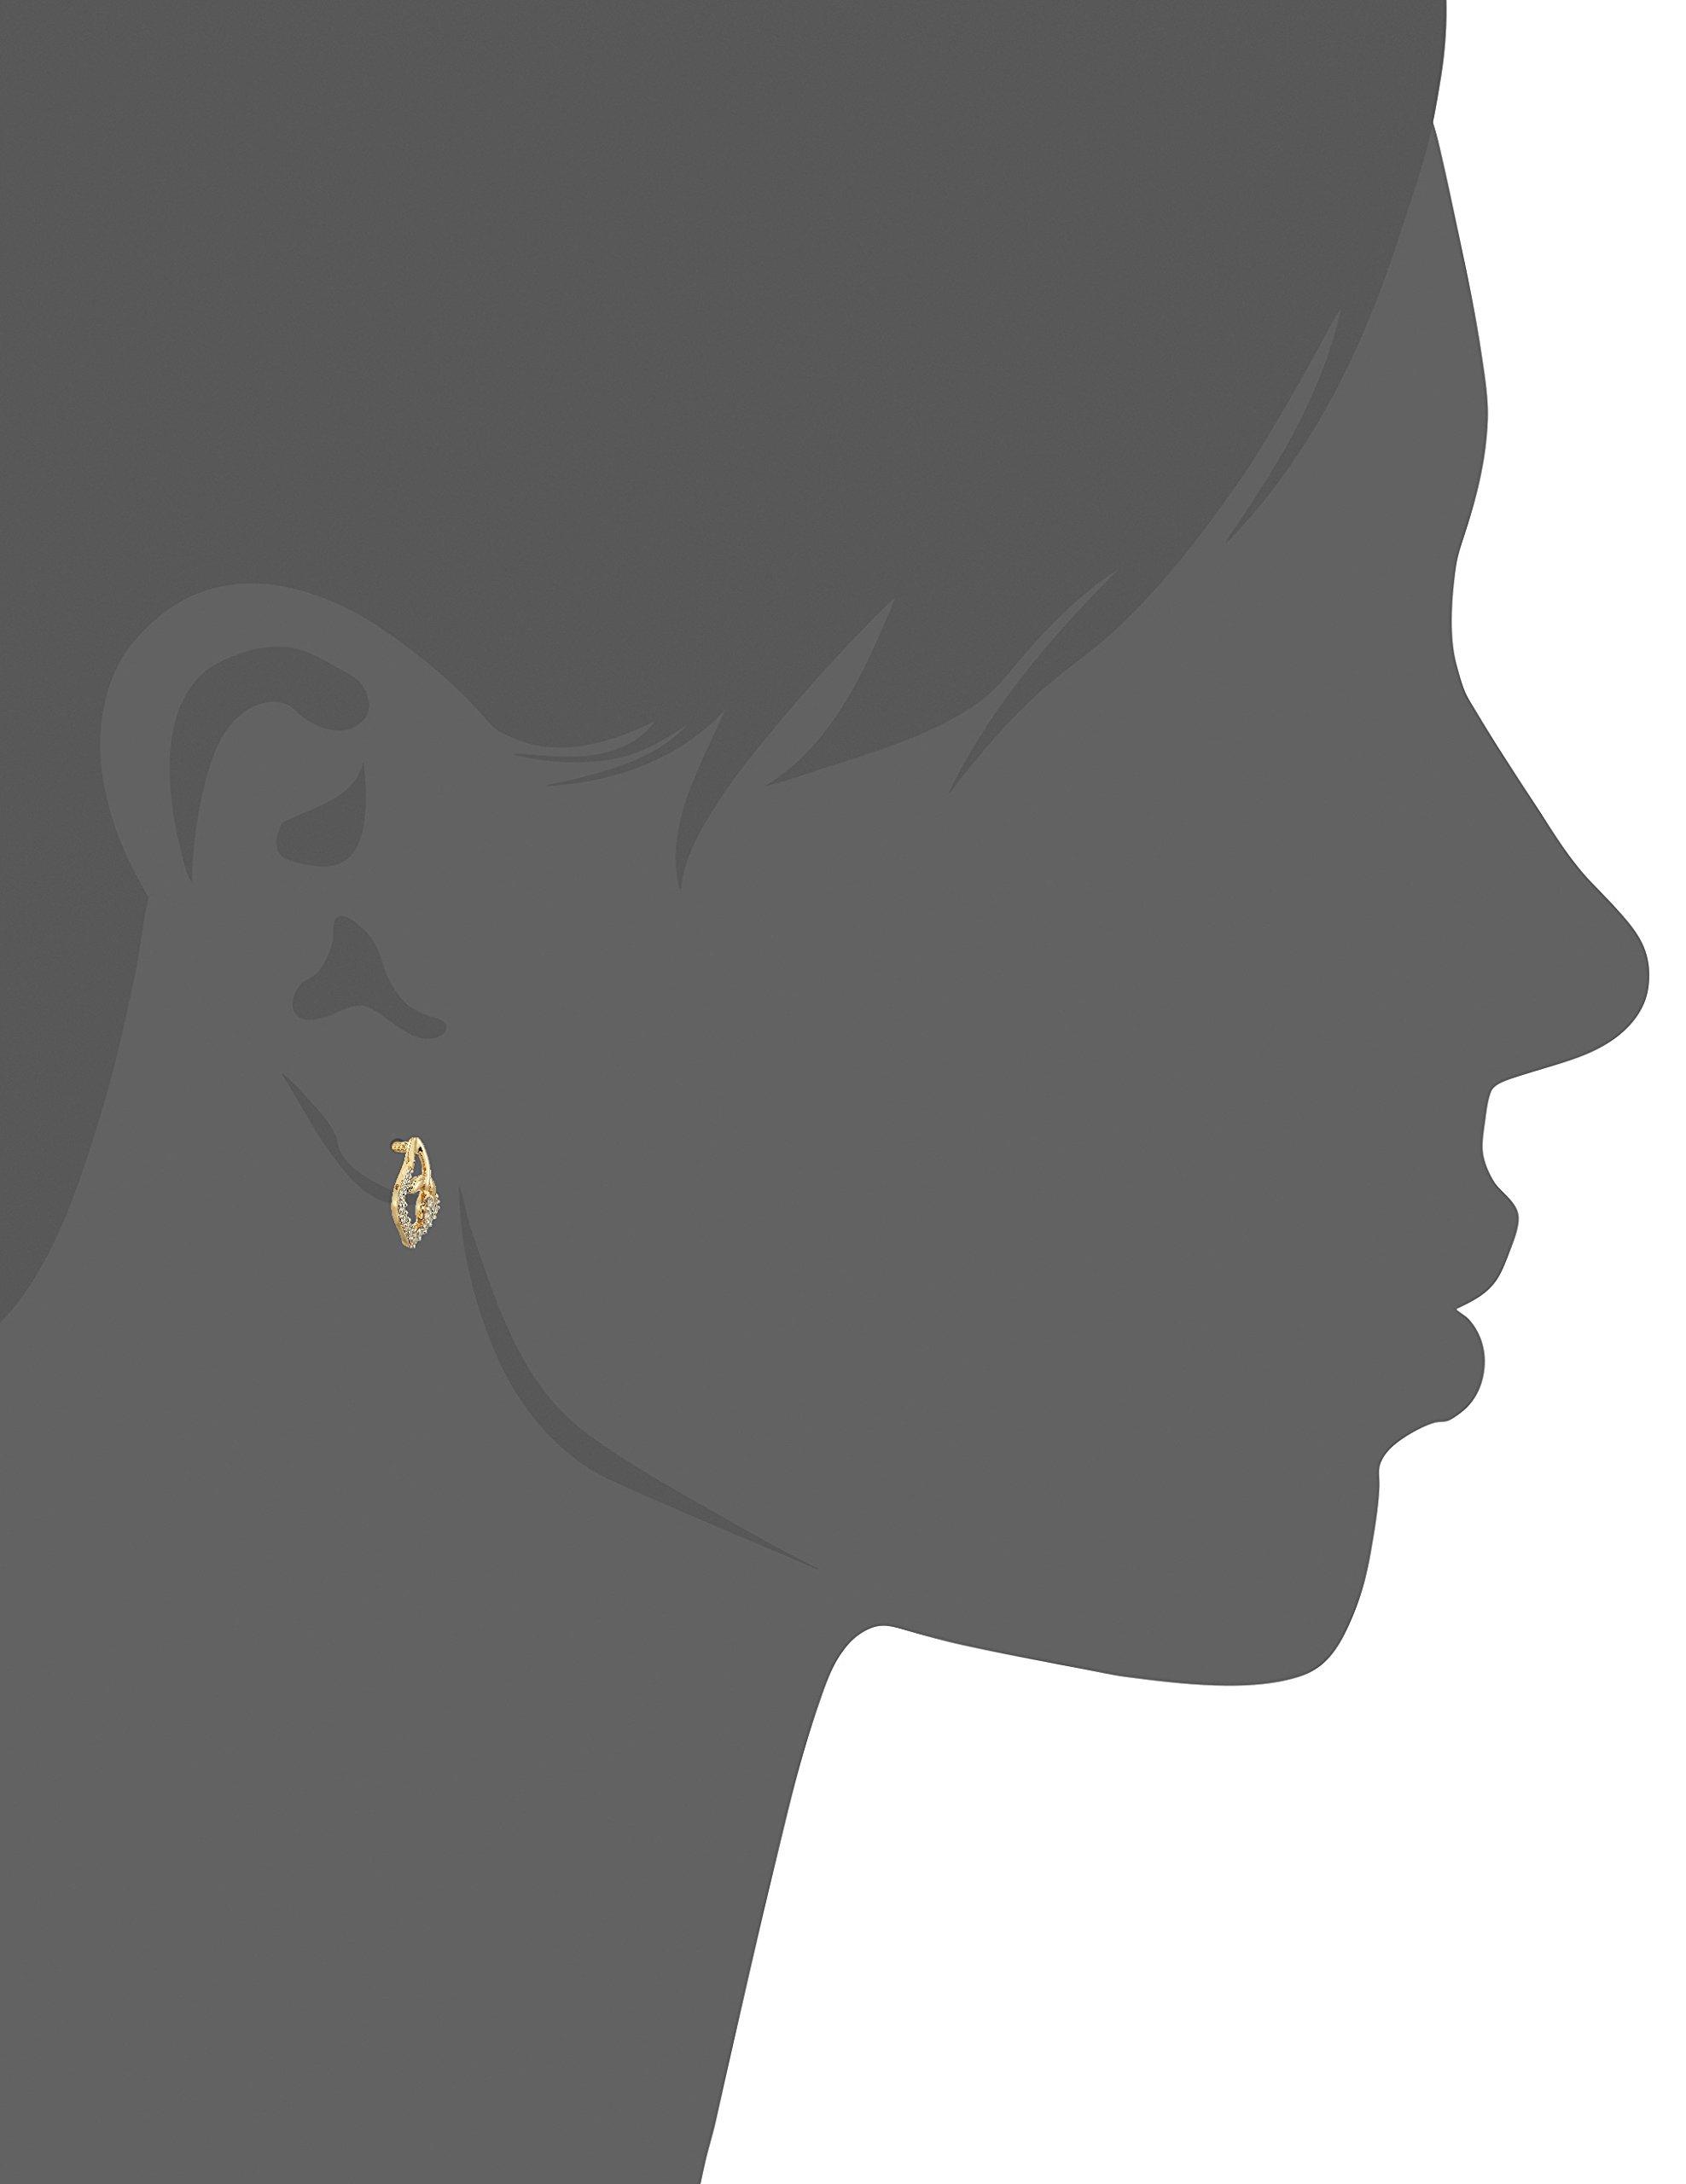 Senco Gold 14KT Yellow Gold and Diamond Stud Earrings for Women (DT-D000123780)